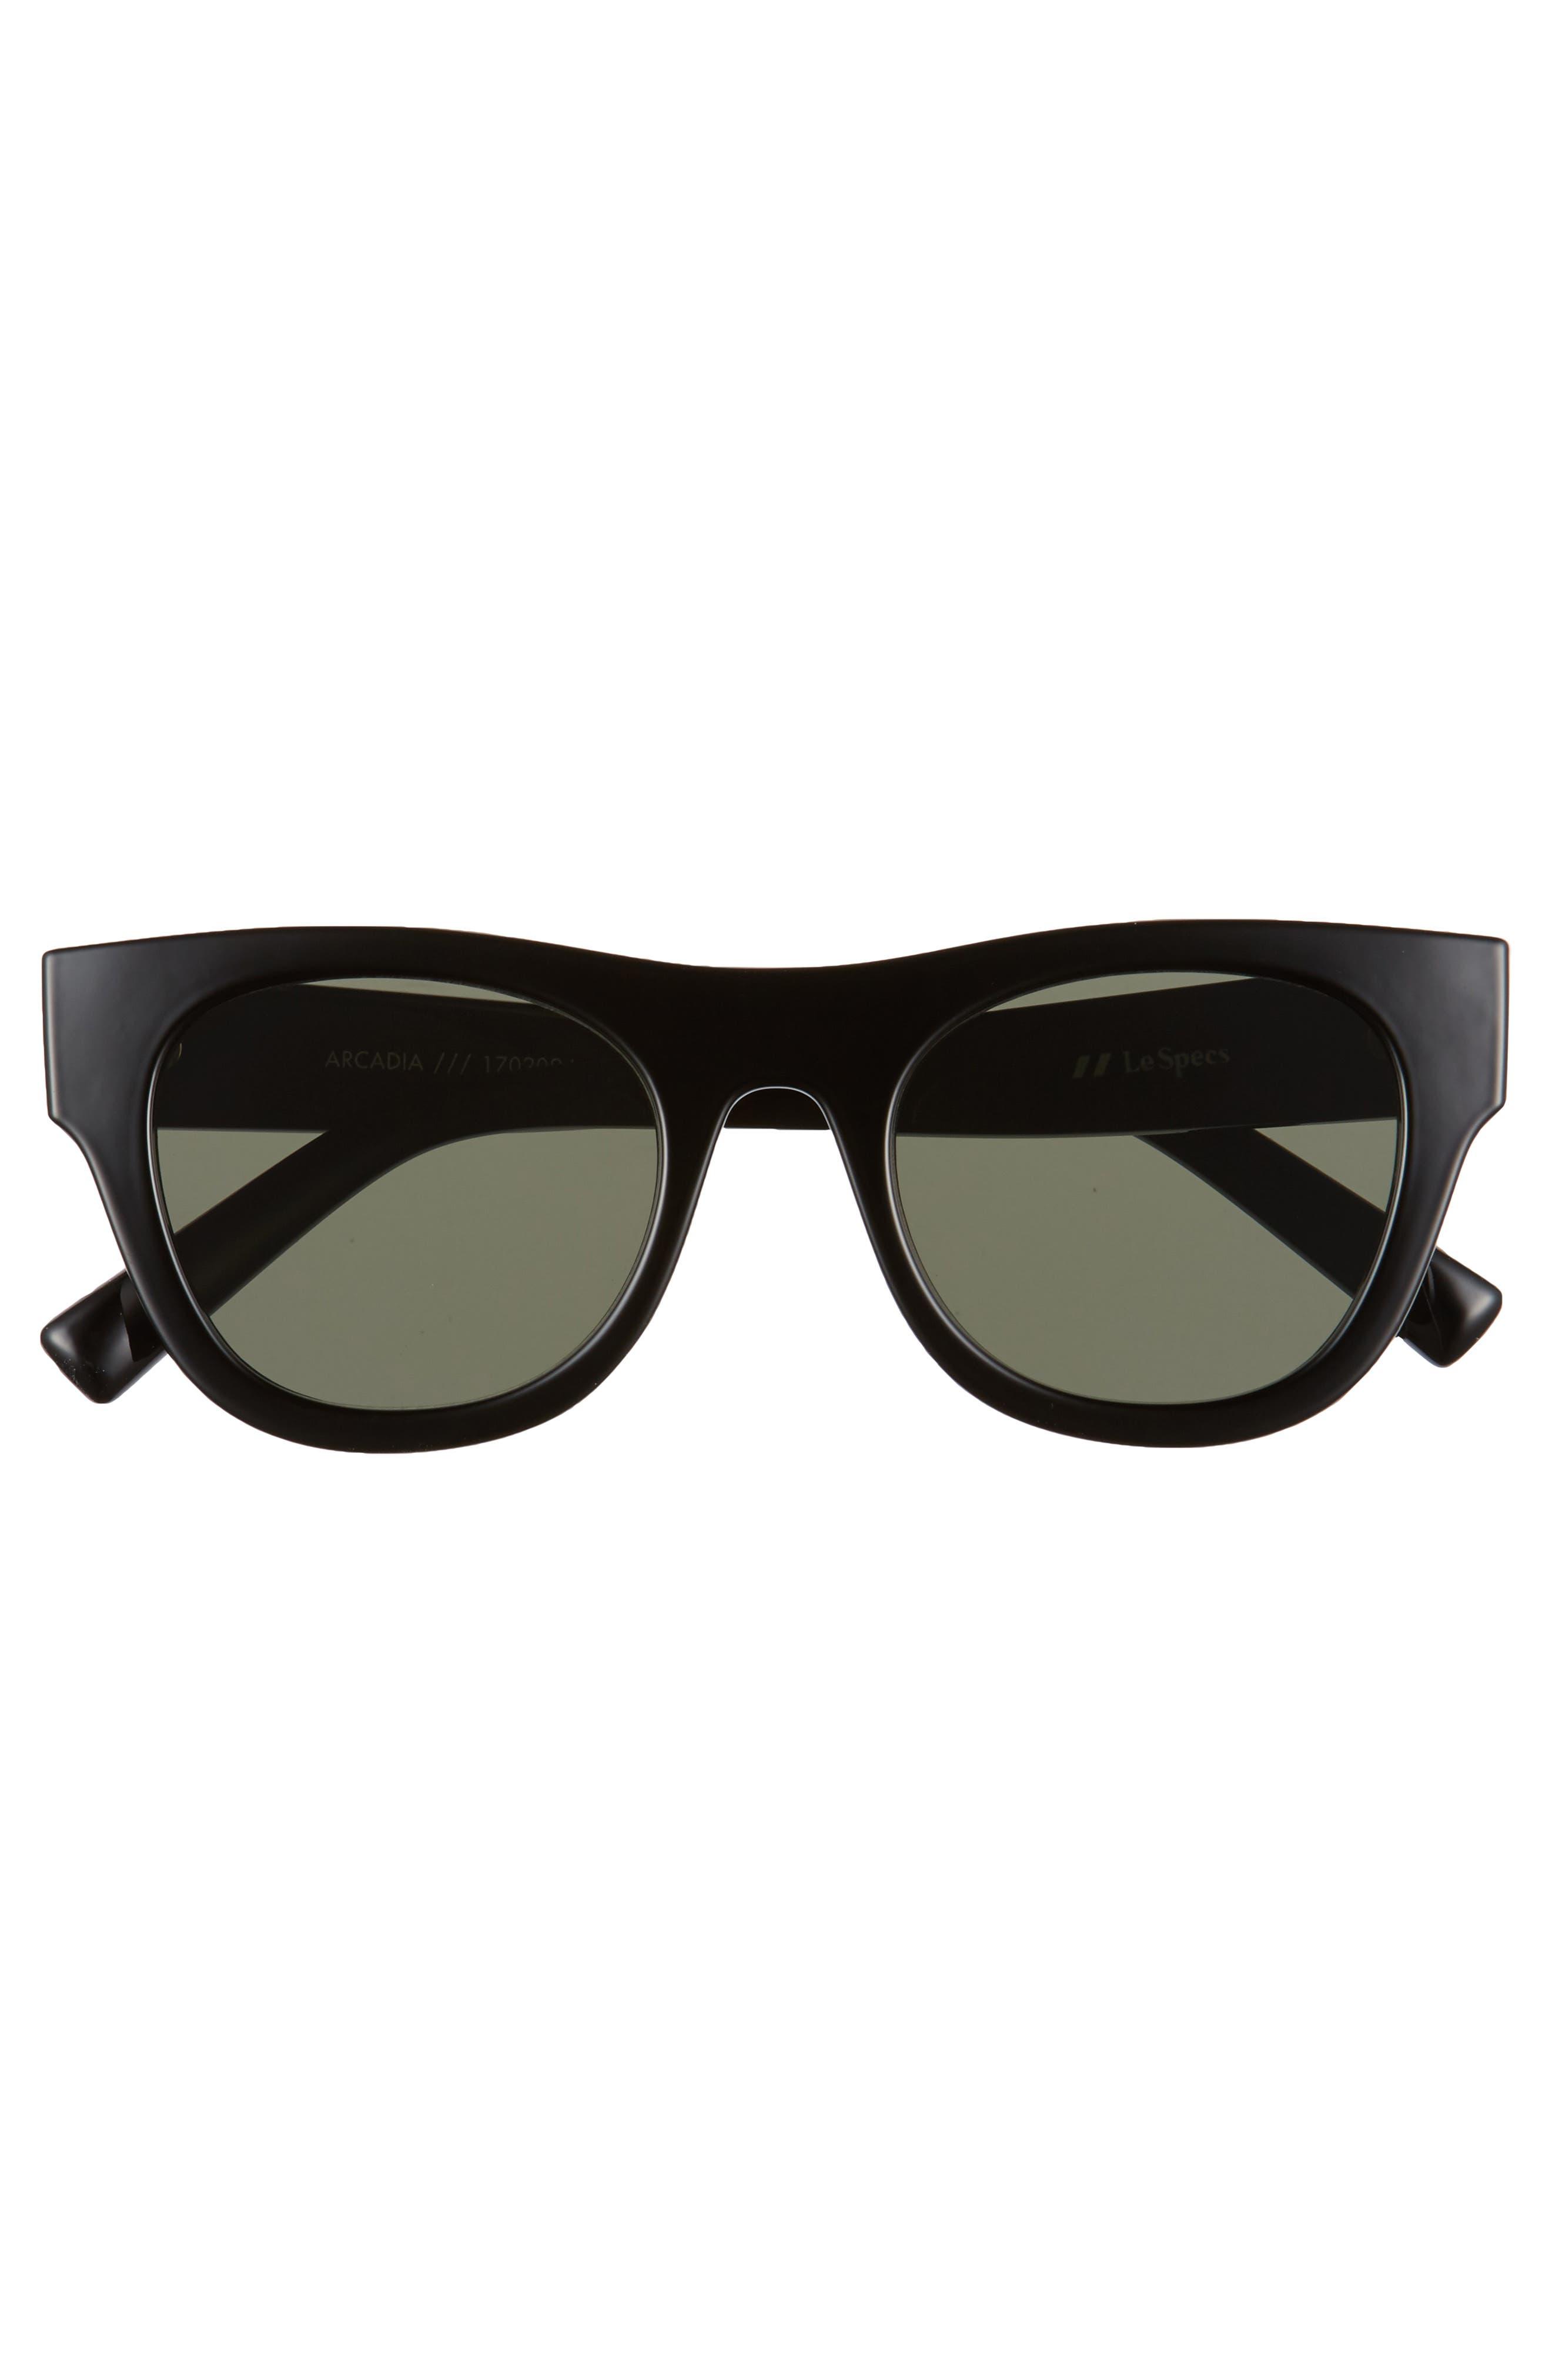 Arcadia 49mm Sunglasses,                             Alternate thumbnail 3, color,                             001